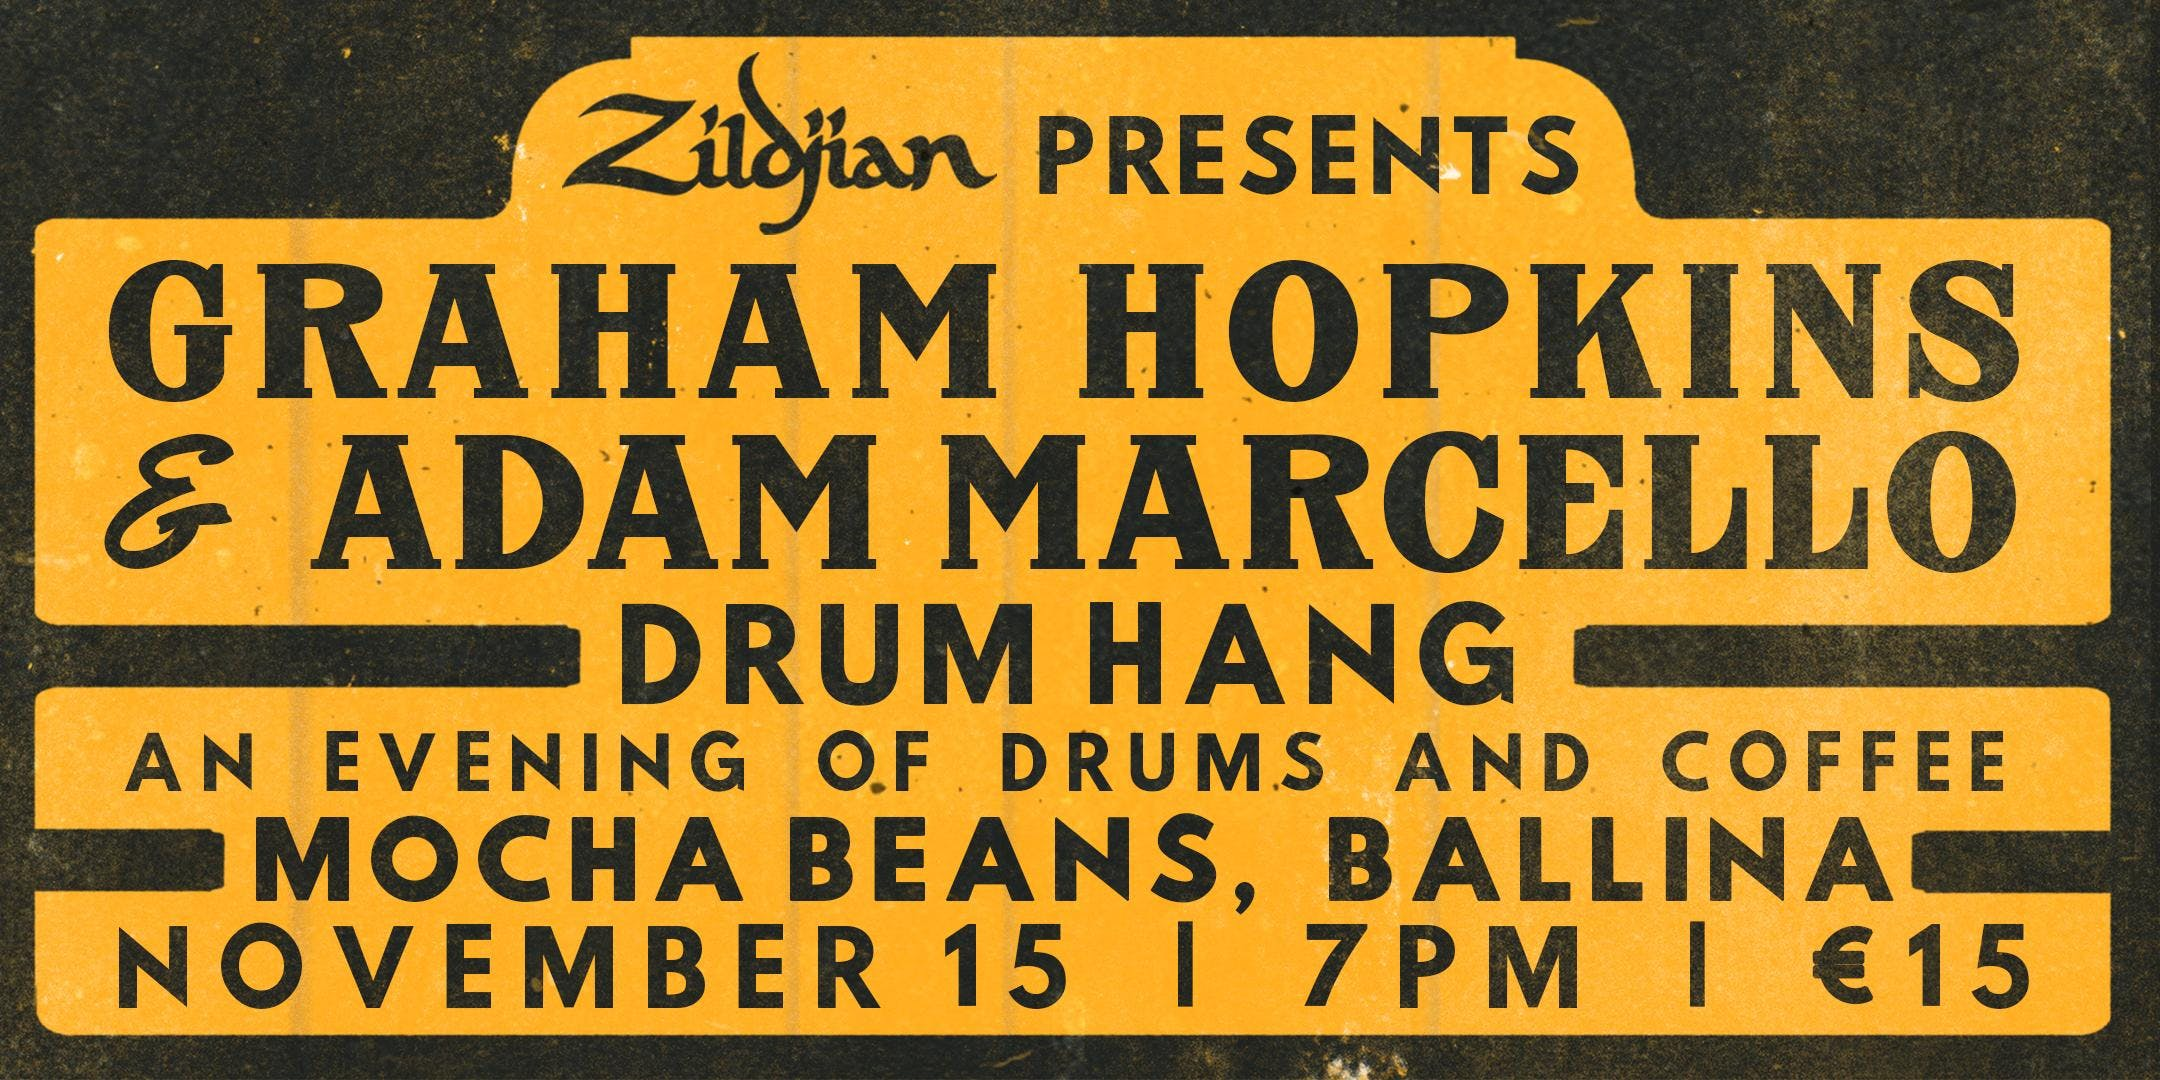 Graham Hopkins & Adam Marcello Drum Hang - Ballina